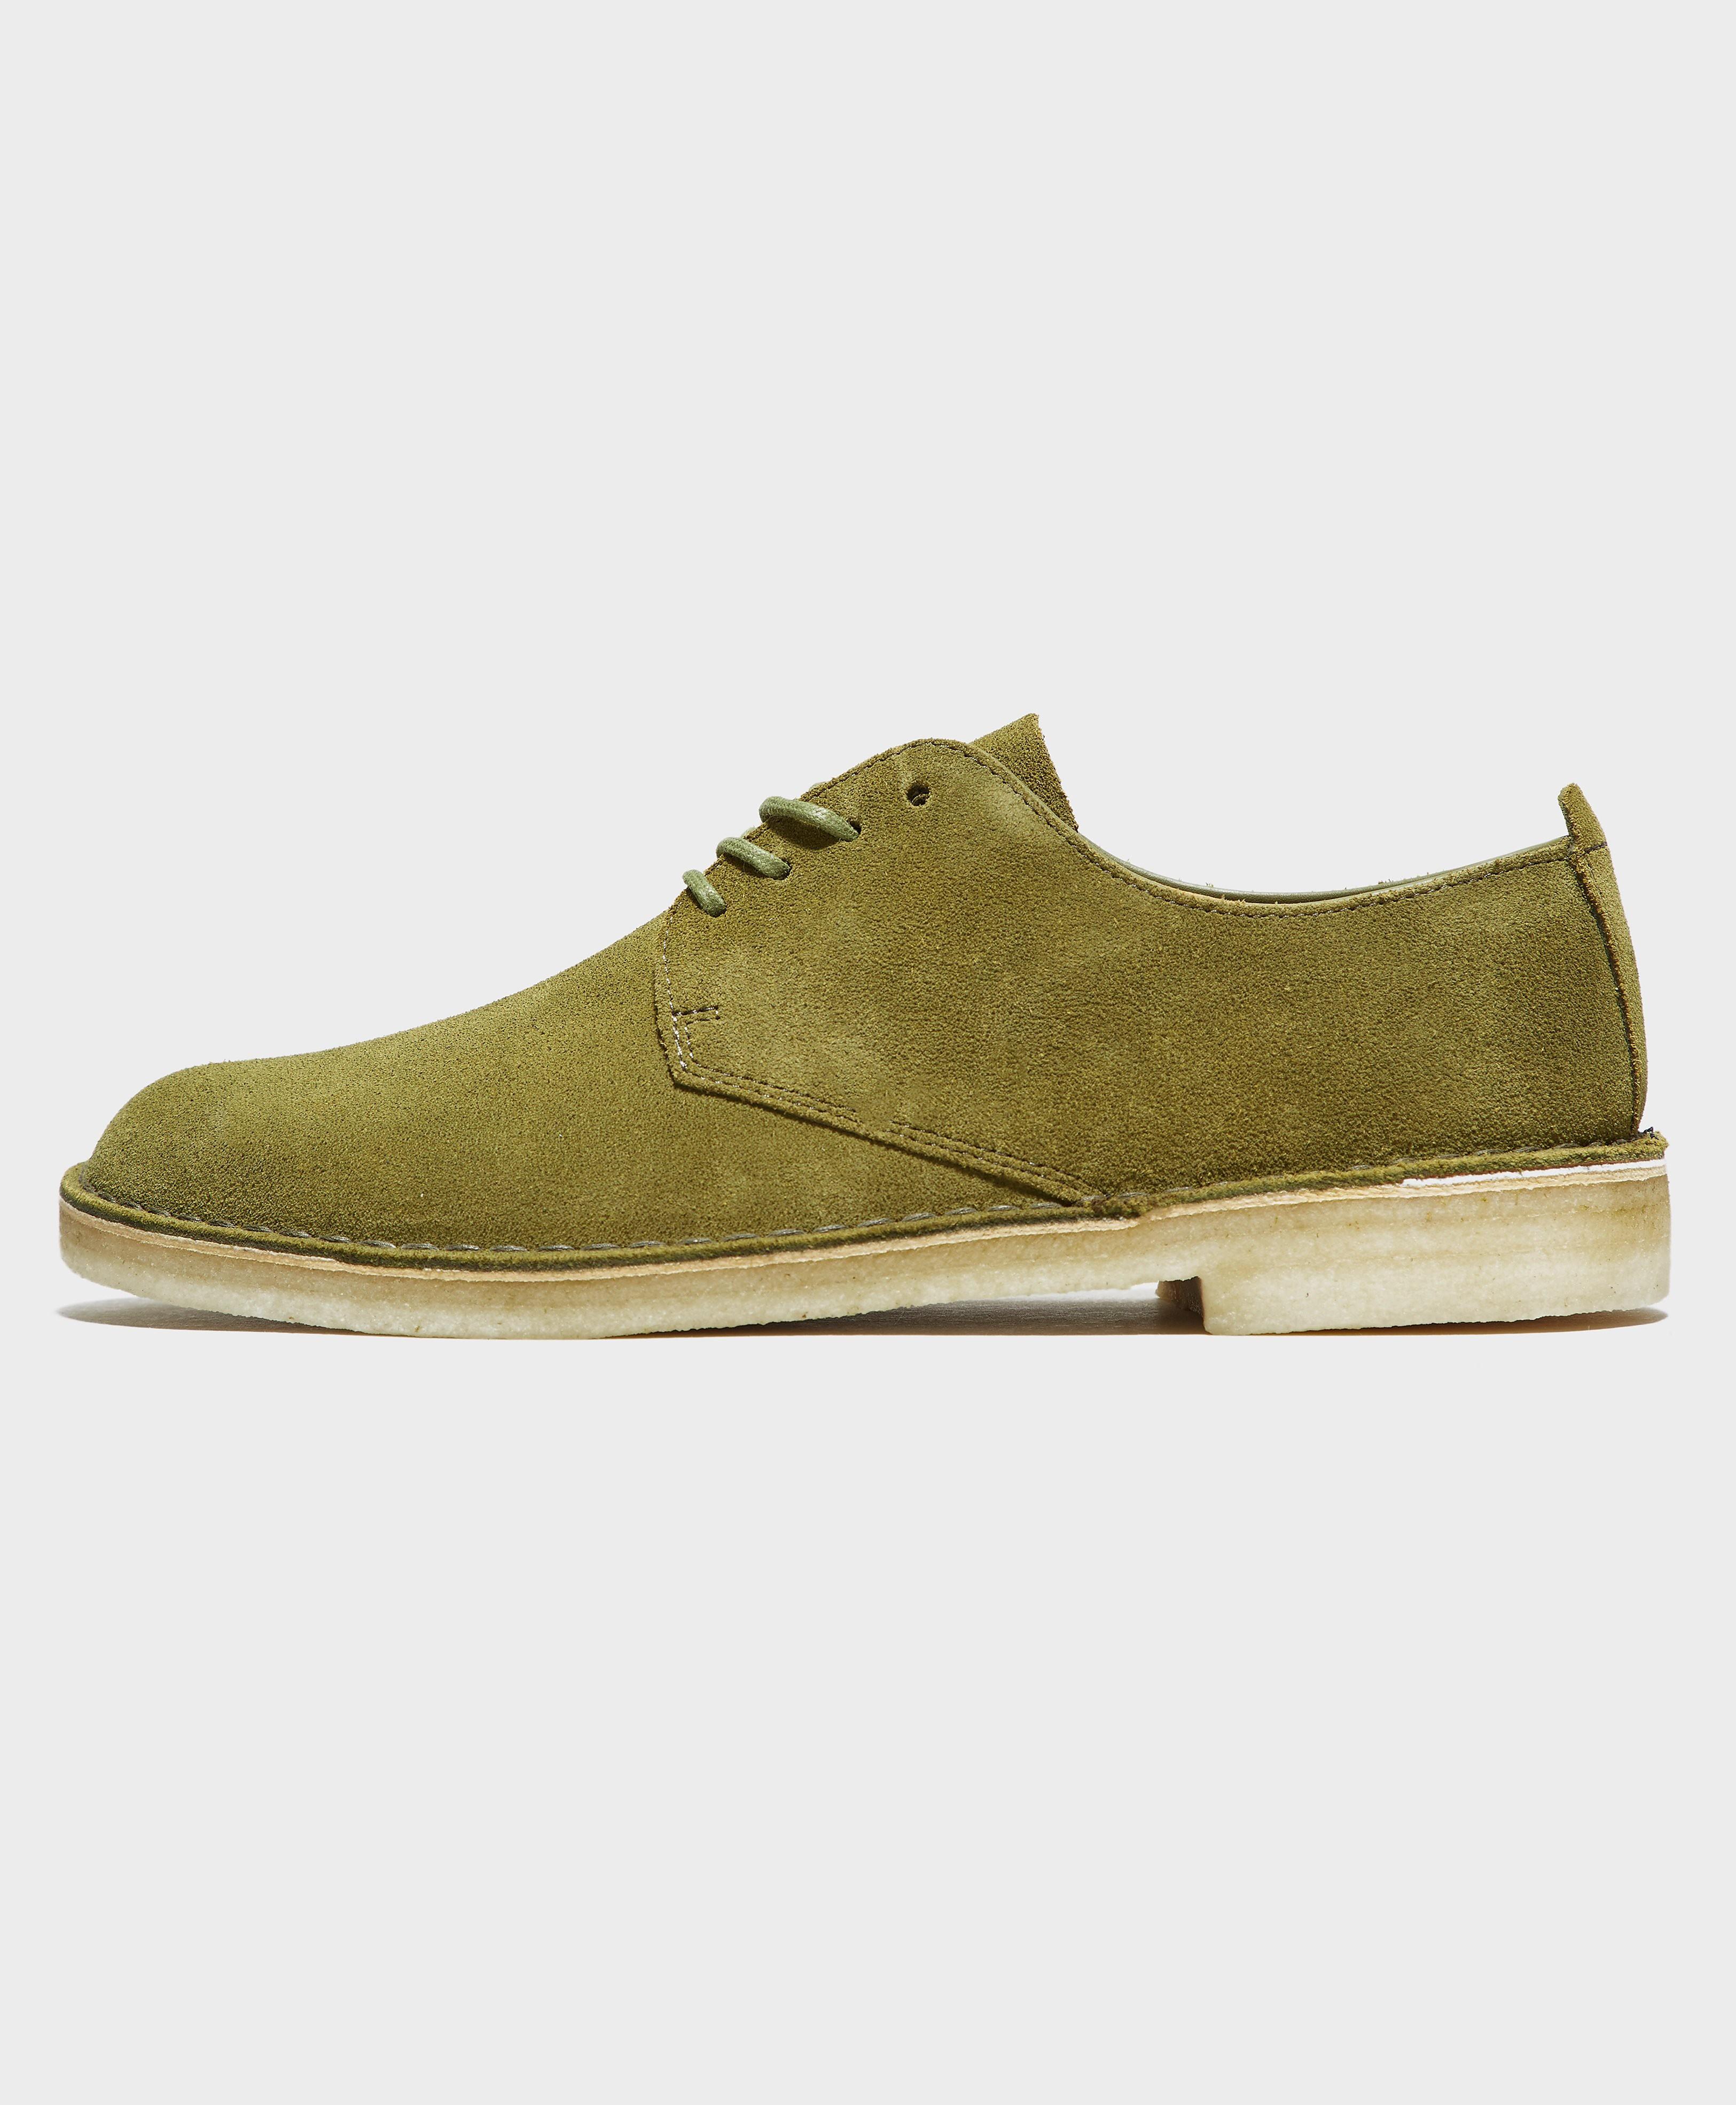 Clarks Originals Desert London Shoe